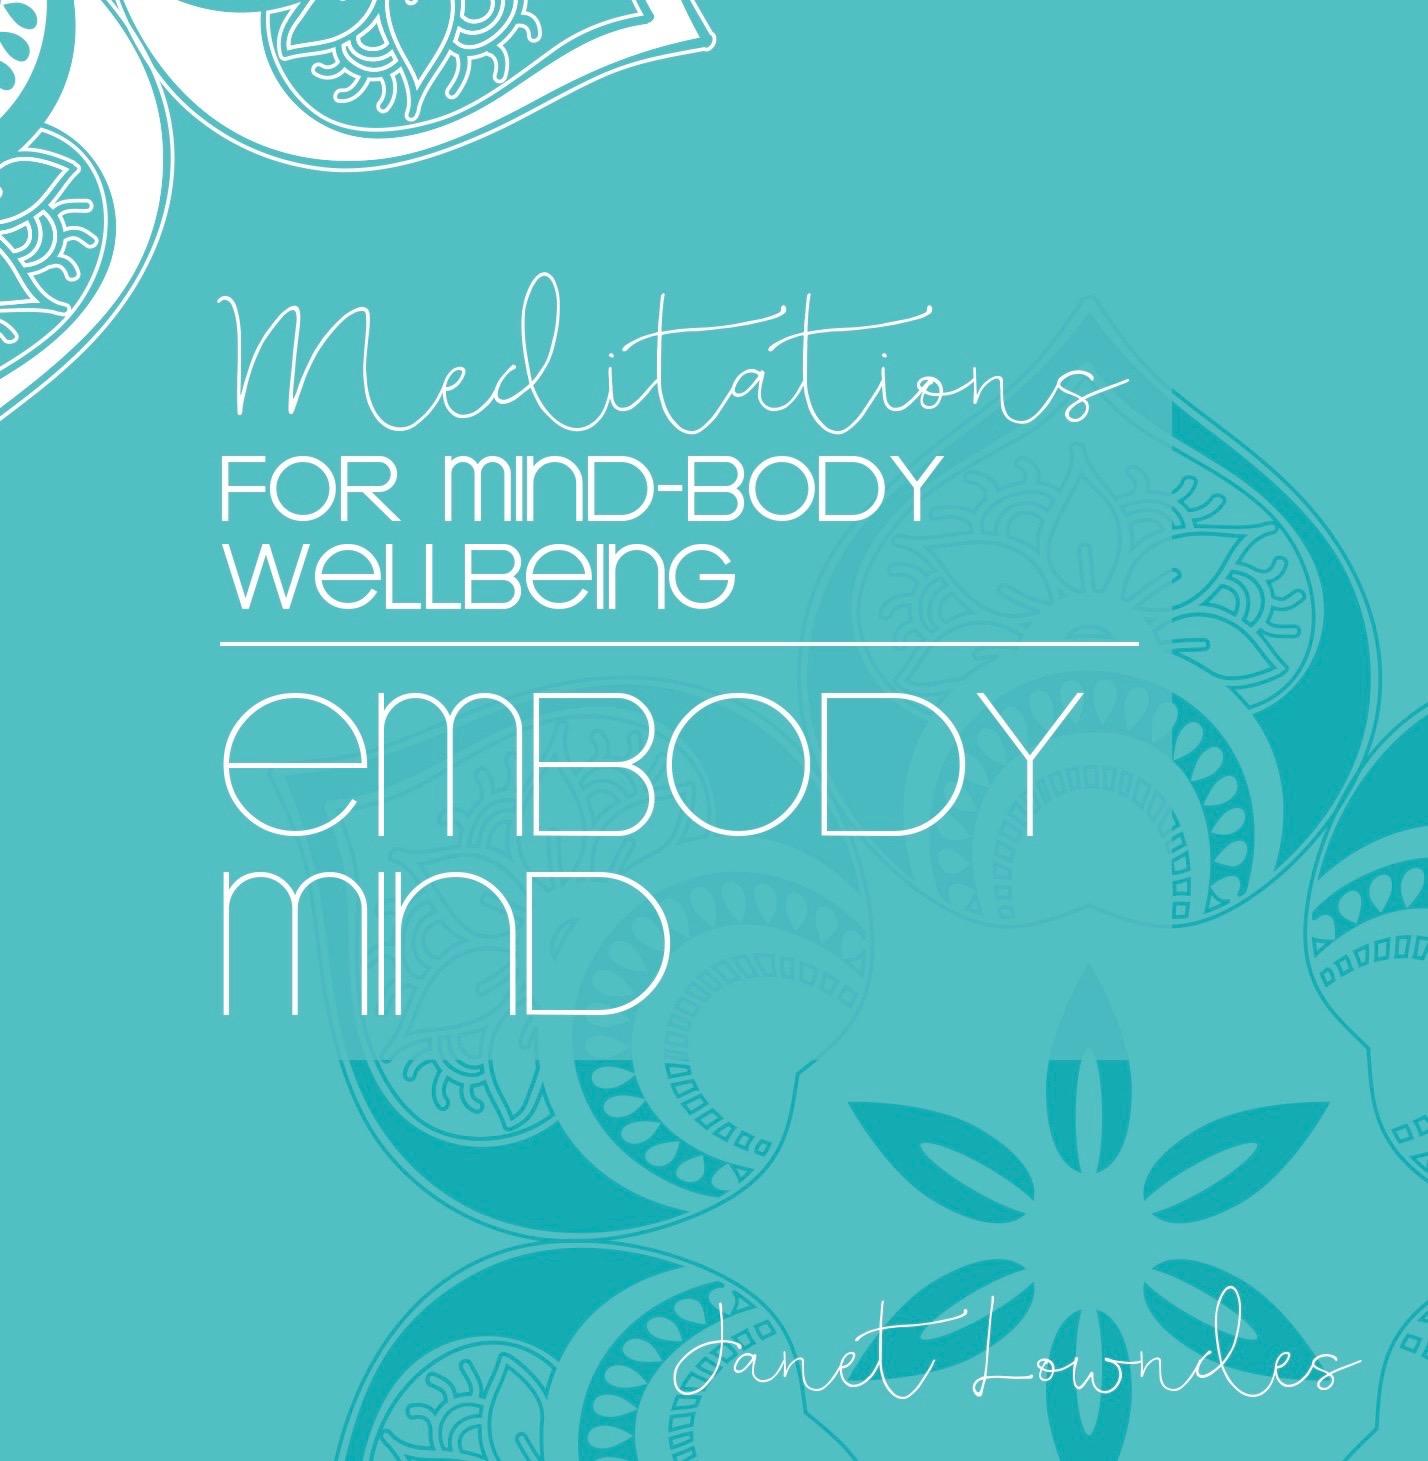 Embody Mind Meditations - Downloadable audio recordings